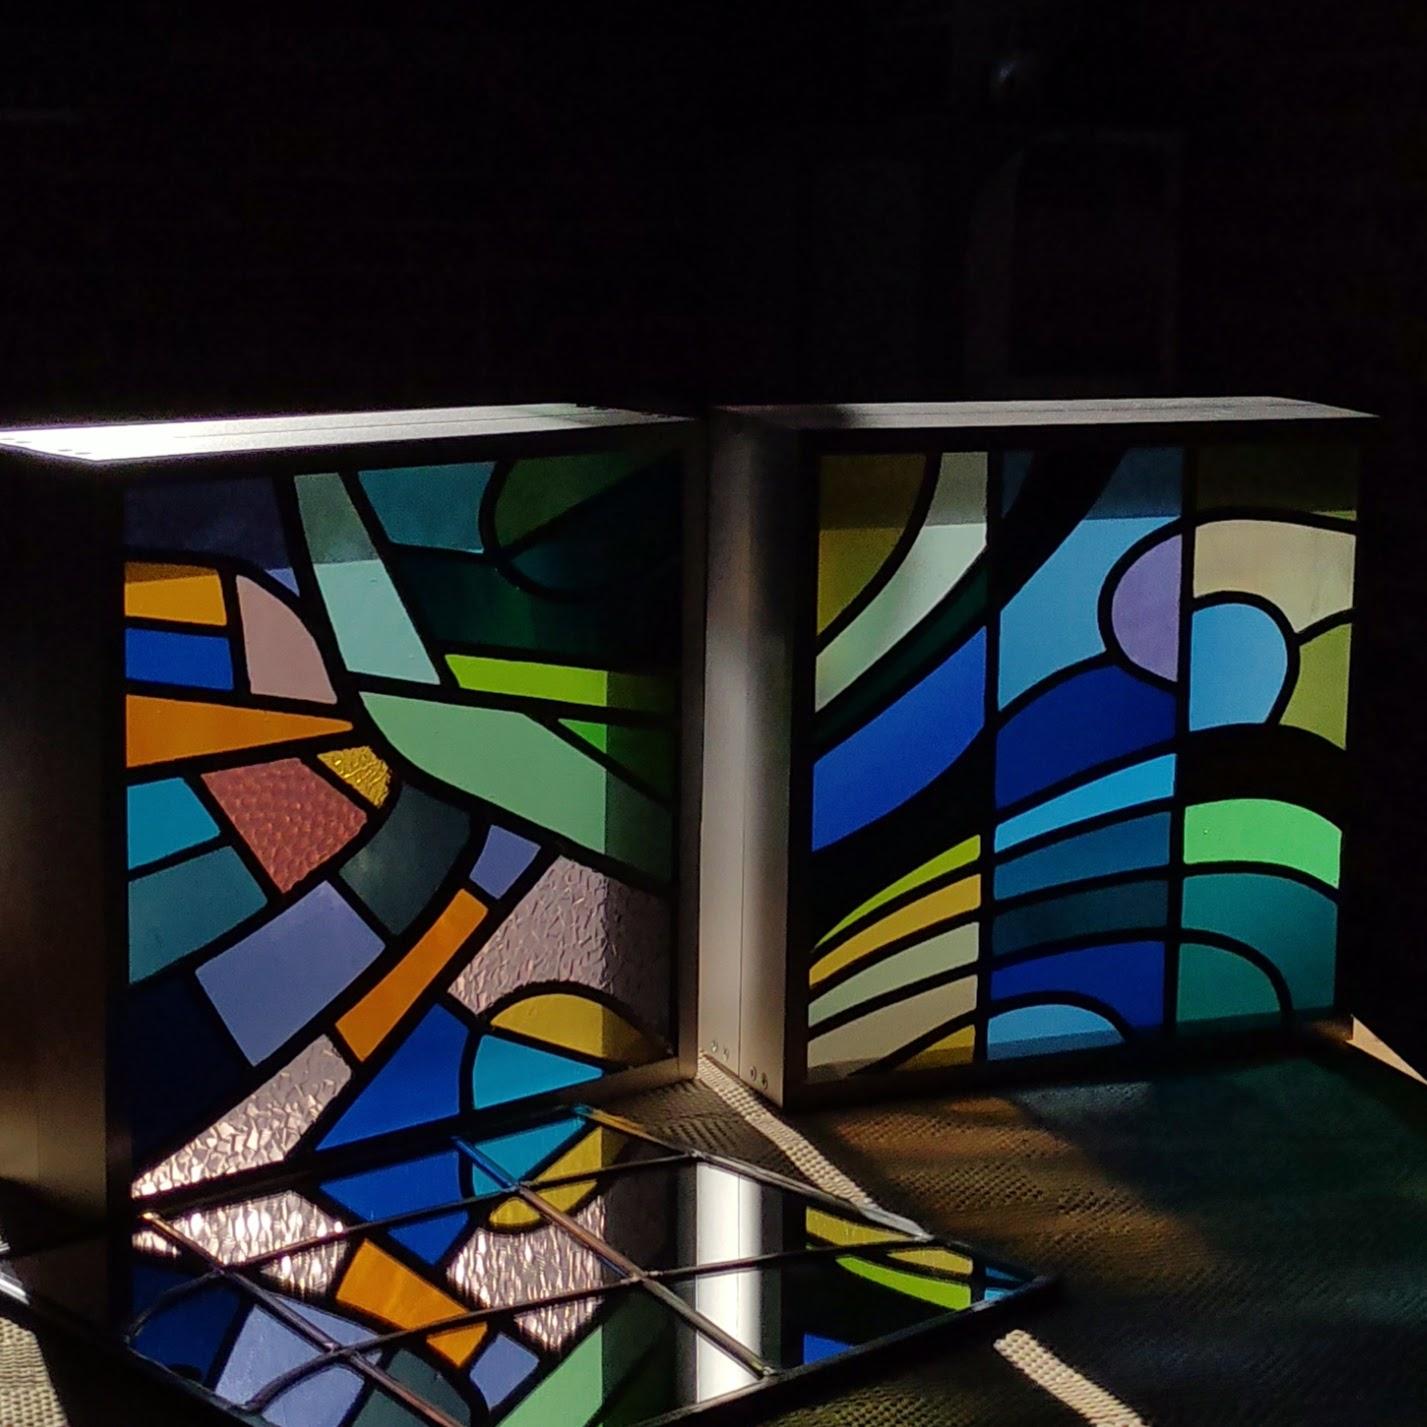 lightbox stained glass glasraam vitrail